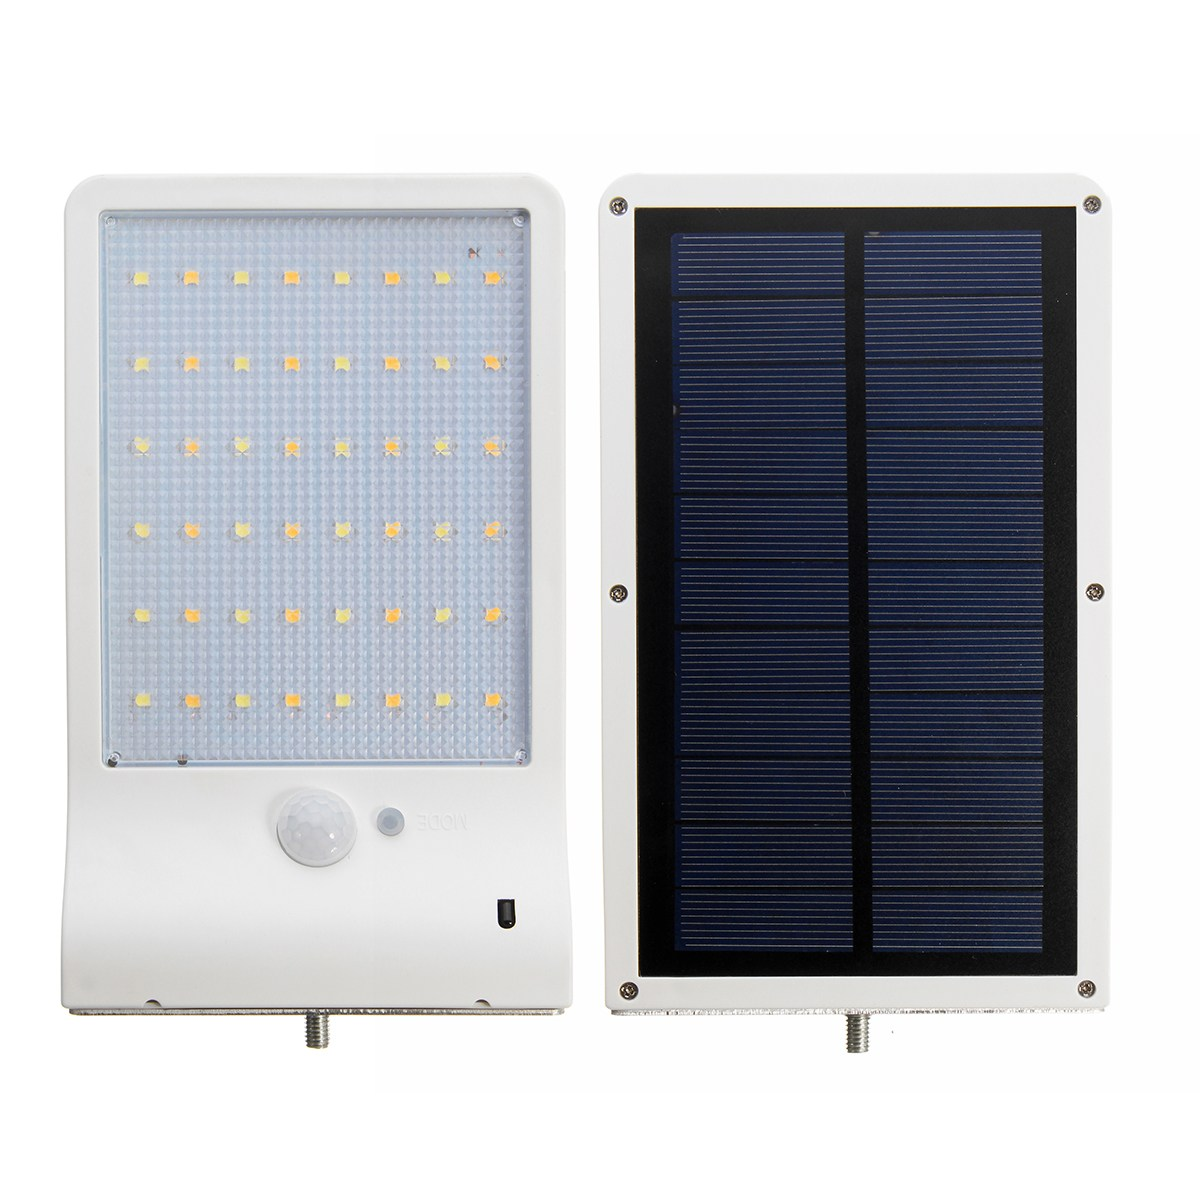 Solar Power 48 Led Solar Light PIR Motion Sensor Wall Garden Light LED Street Lamp Remote IP65 With Remote Control